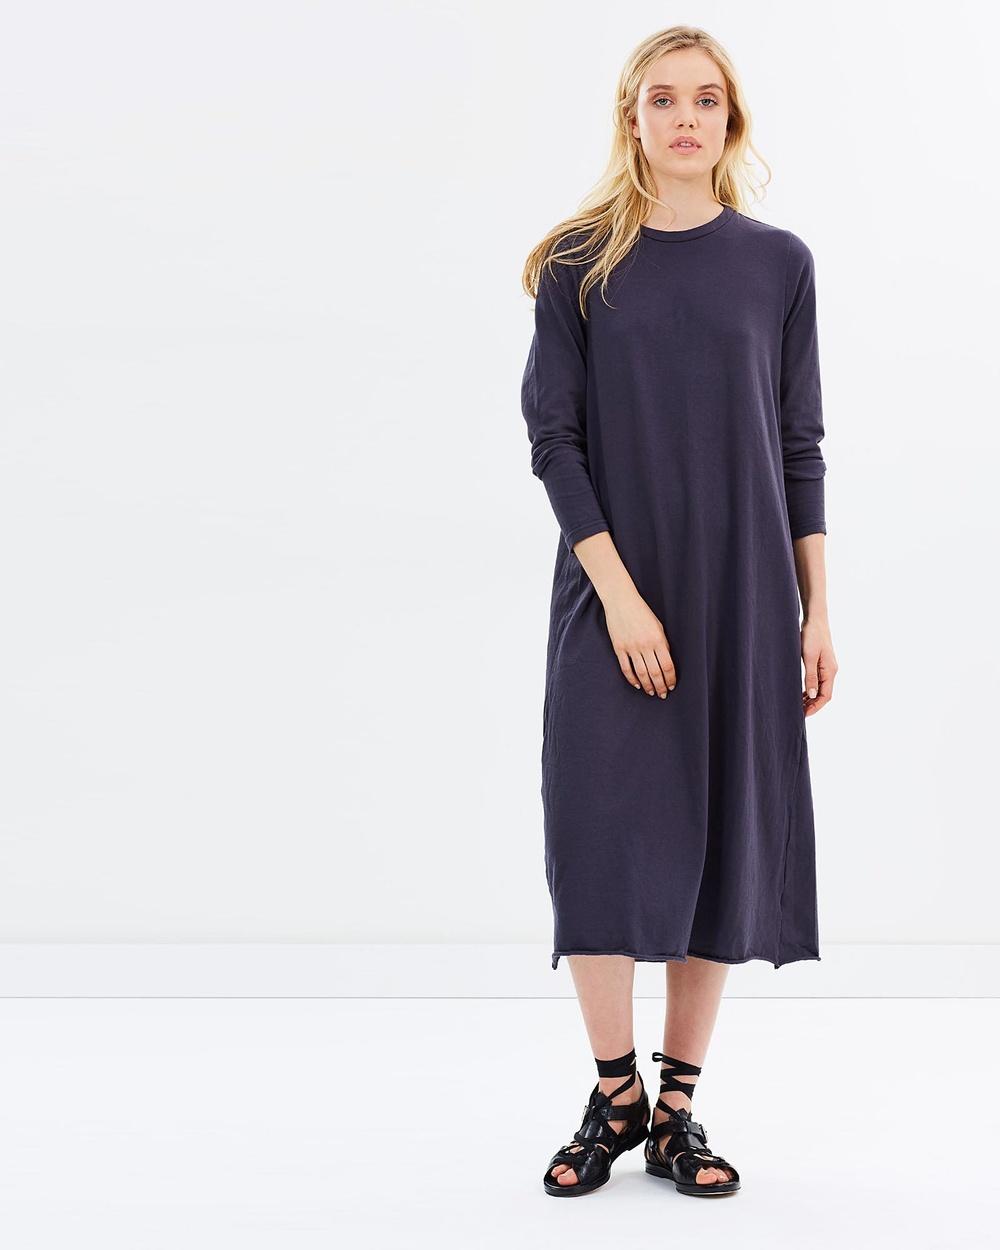 Primness Box Straight Dress Dresses Smoked Charcoal Box Straight Dress